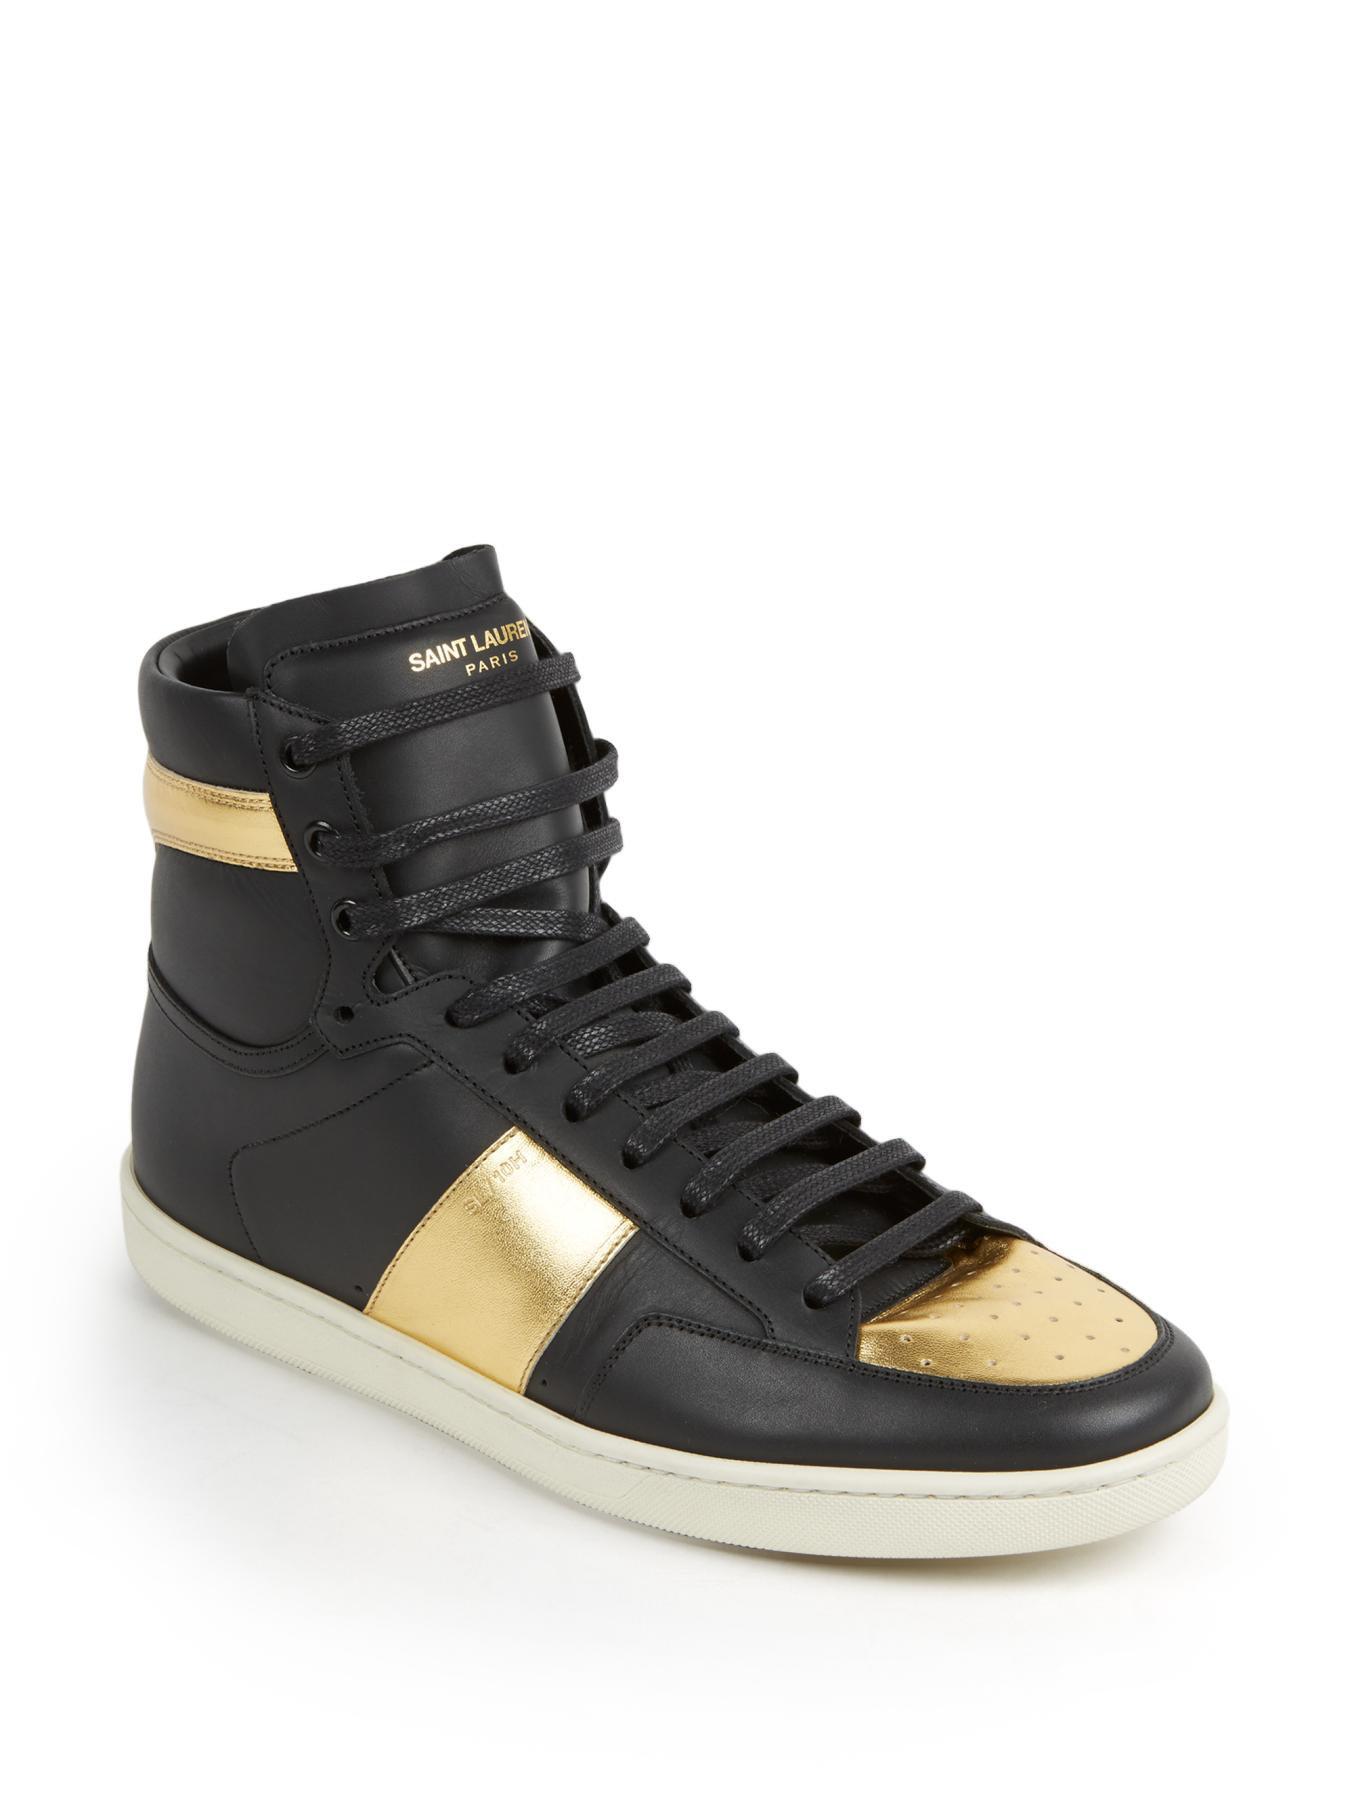 saint laurent metallic colorblocked leather high top sneakers in black for men lyst. Black Bedroom Furniture Sets. Home Design Ideas